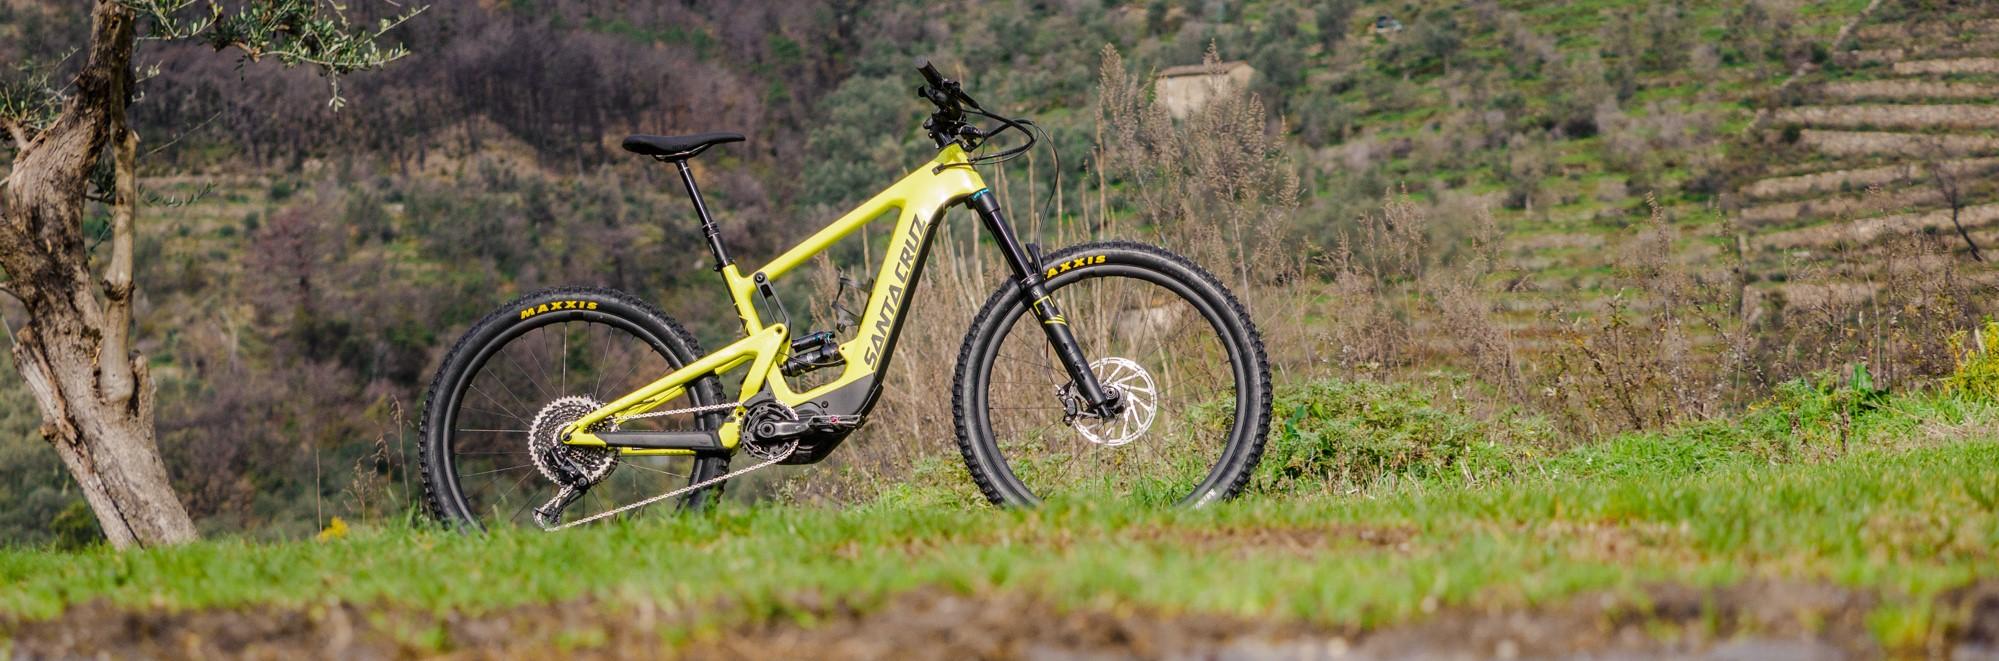 2021 Bikes in stock now